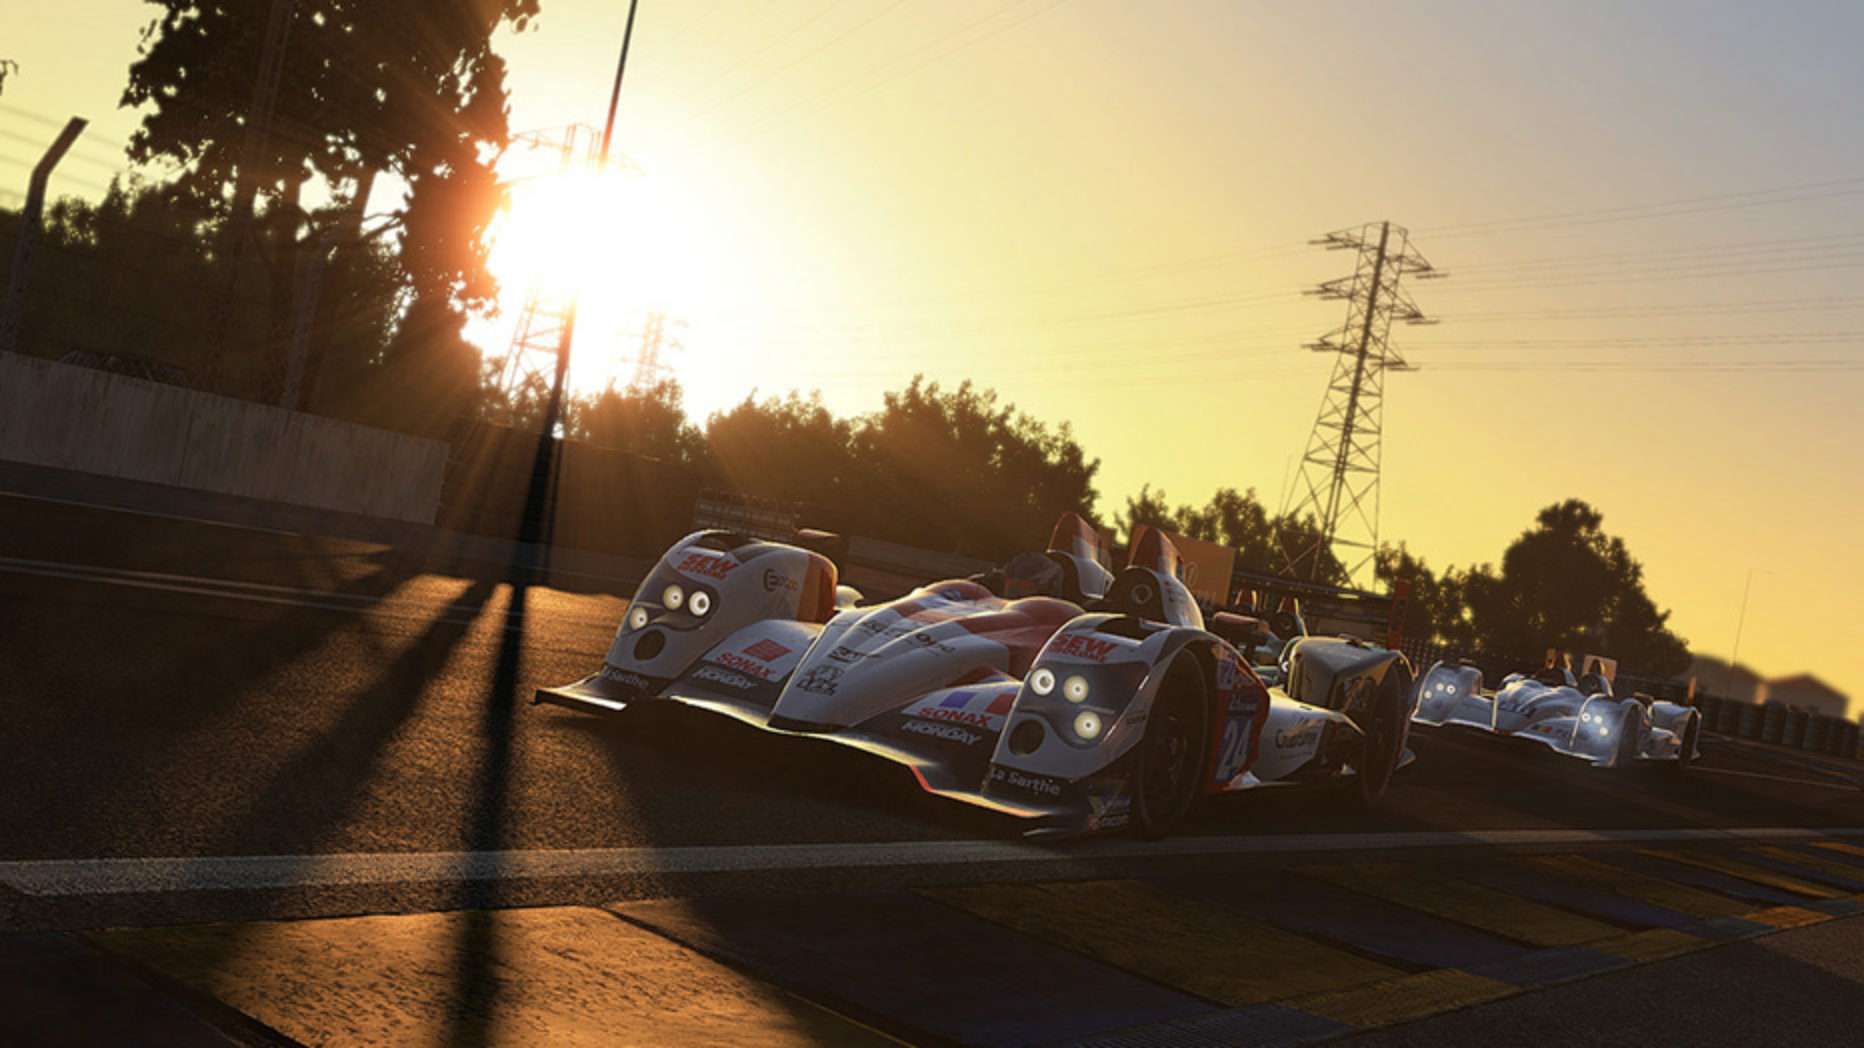 Project CARS: A Petrolhead's Impressions